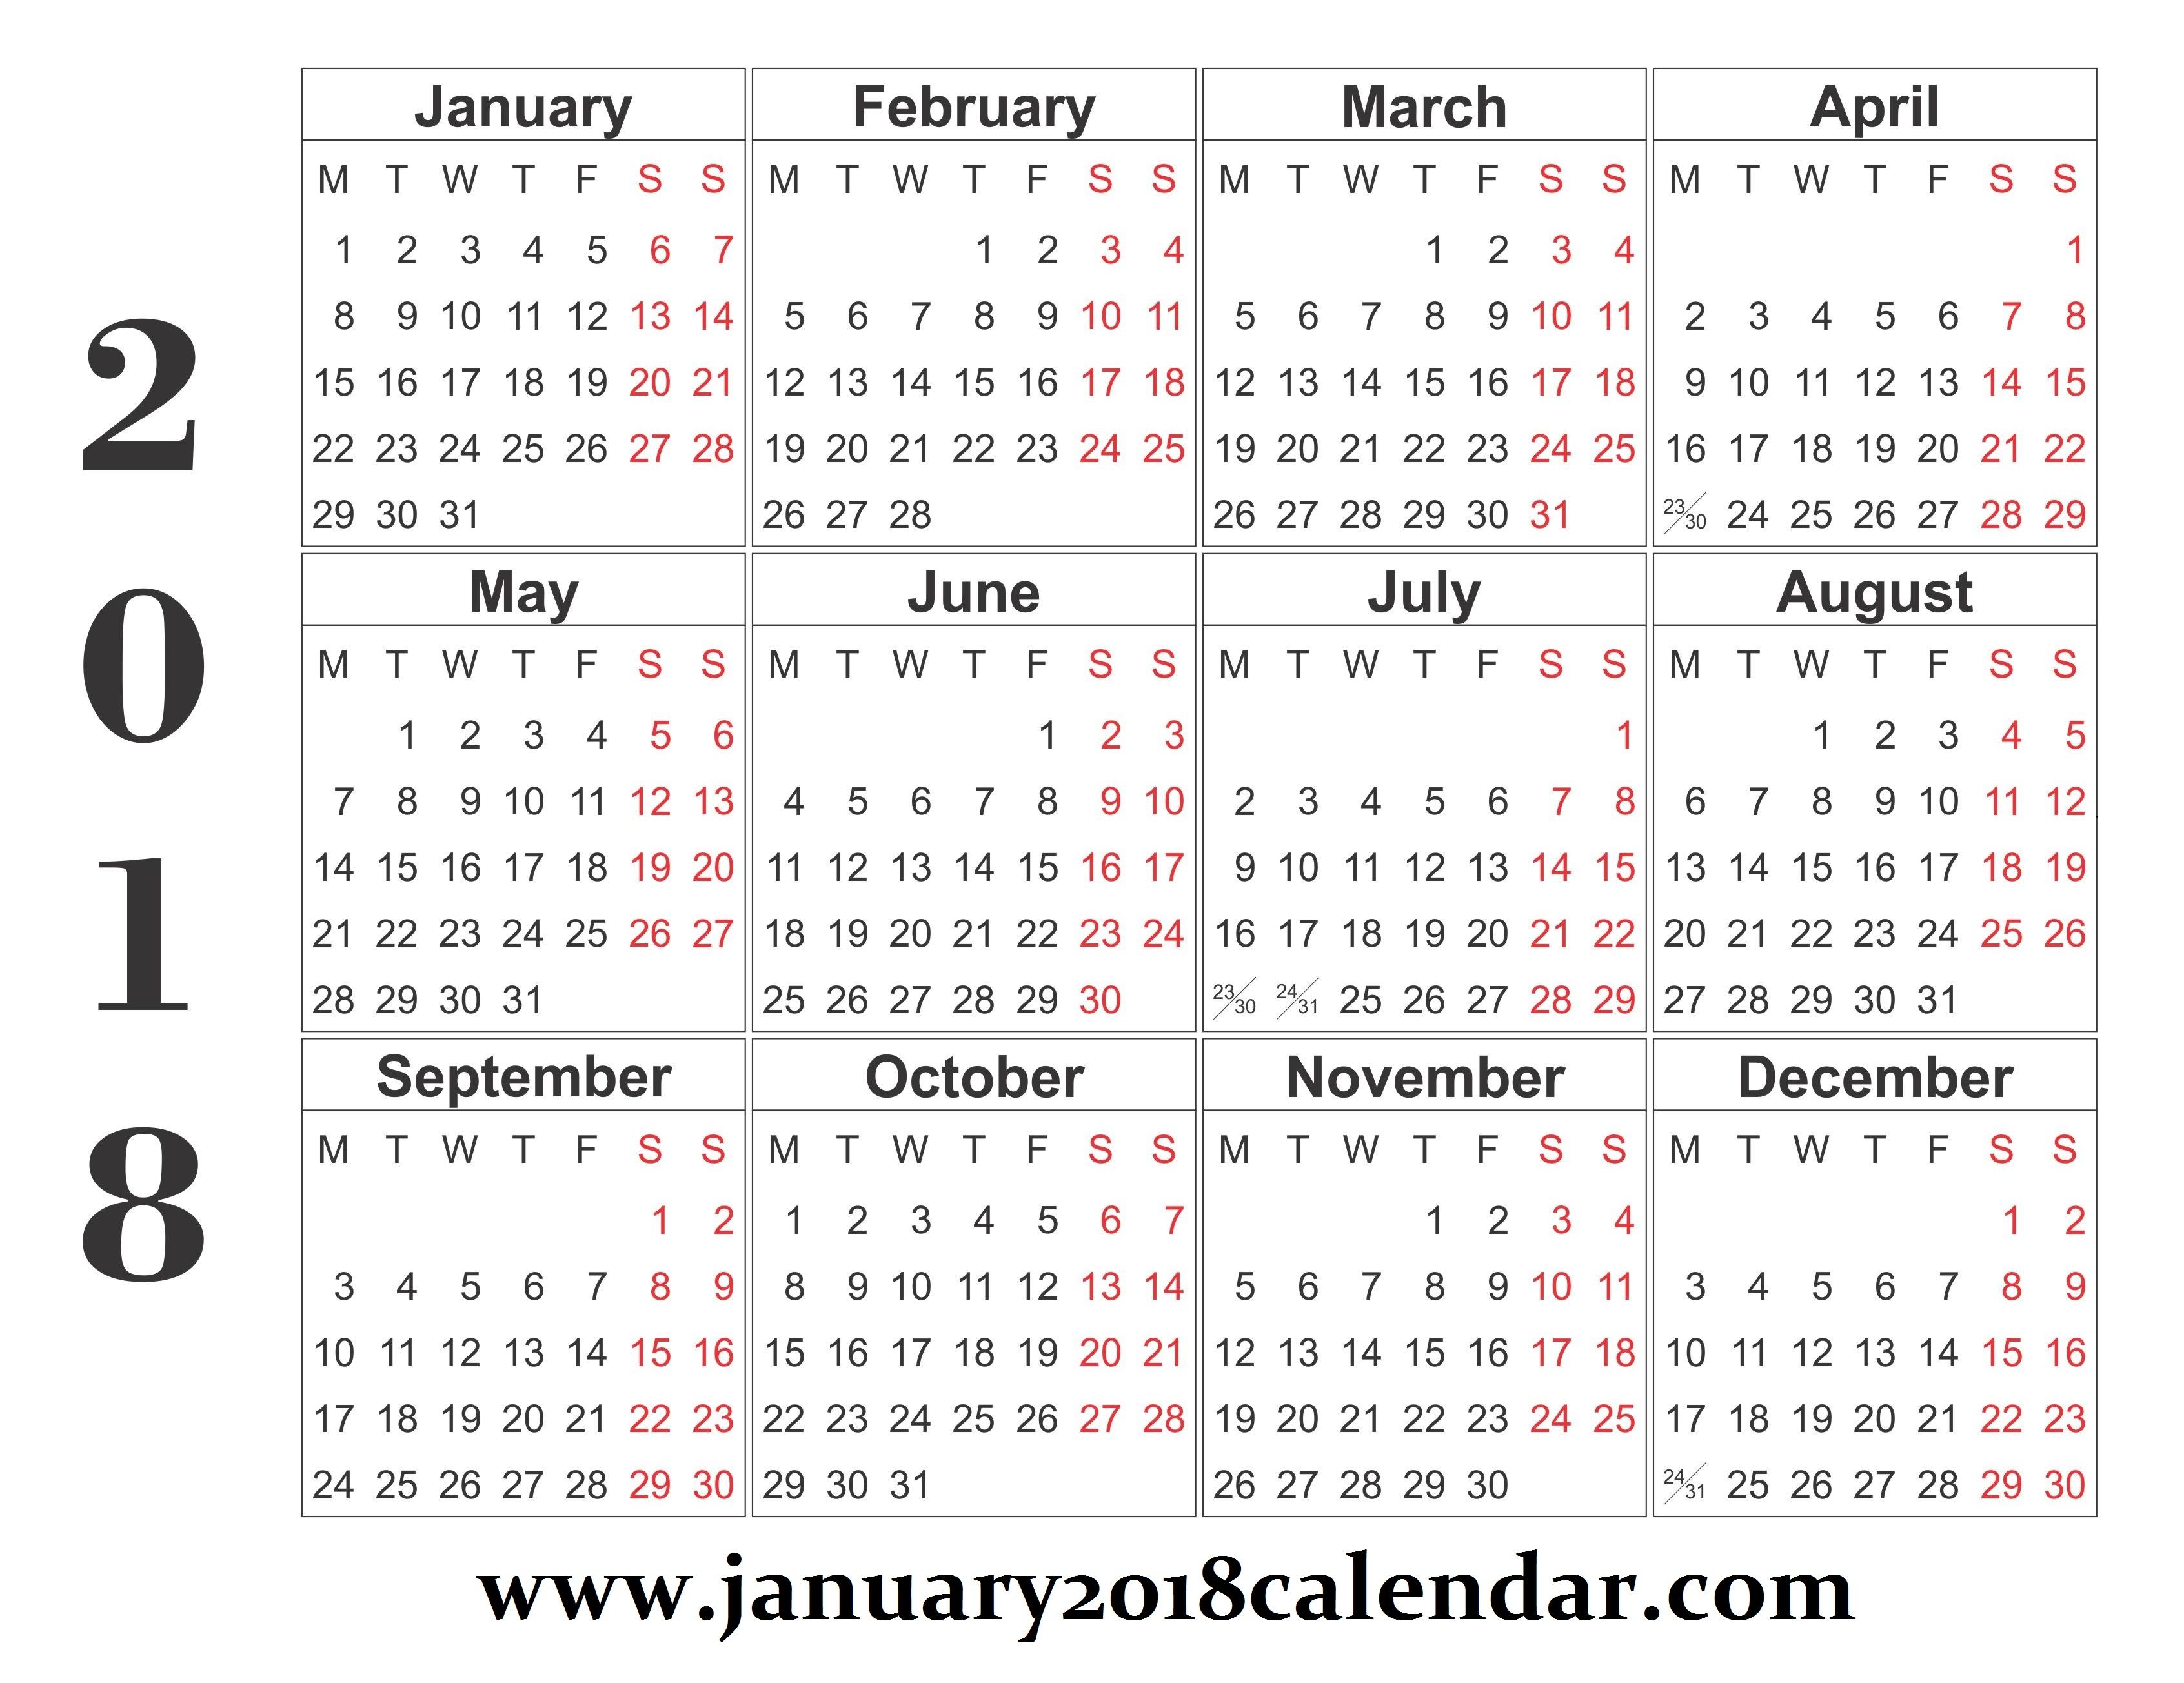 Free Blank Printable Calendar 2018 | January 2018 Calendar